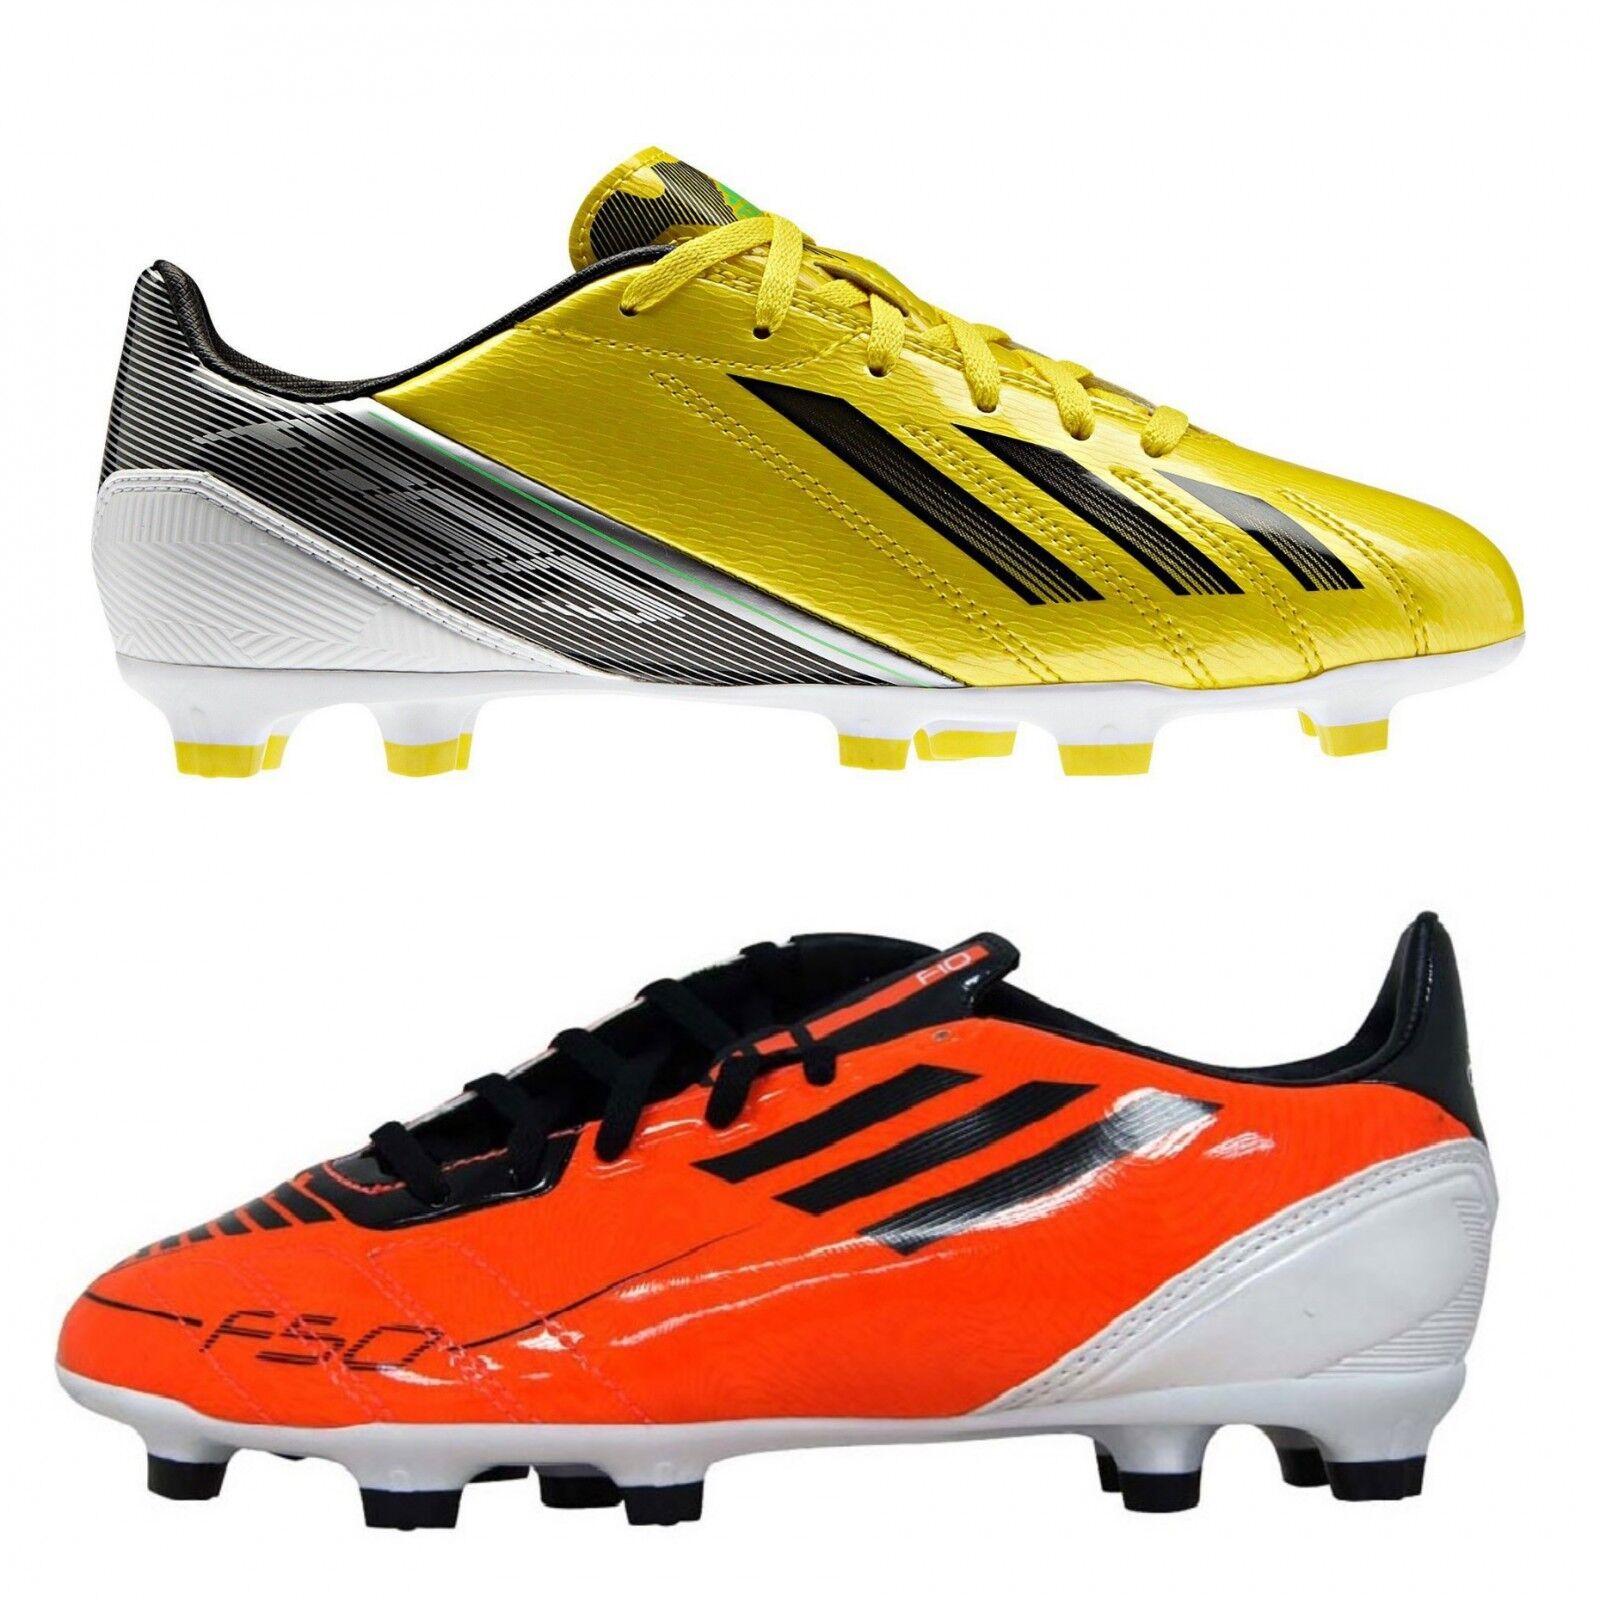 ADIDAS F10 TRX FG J 35-38.5 NEW  Soccer adizero adipure predator f50 f5 zx